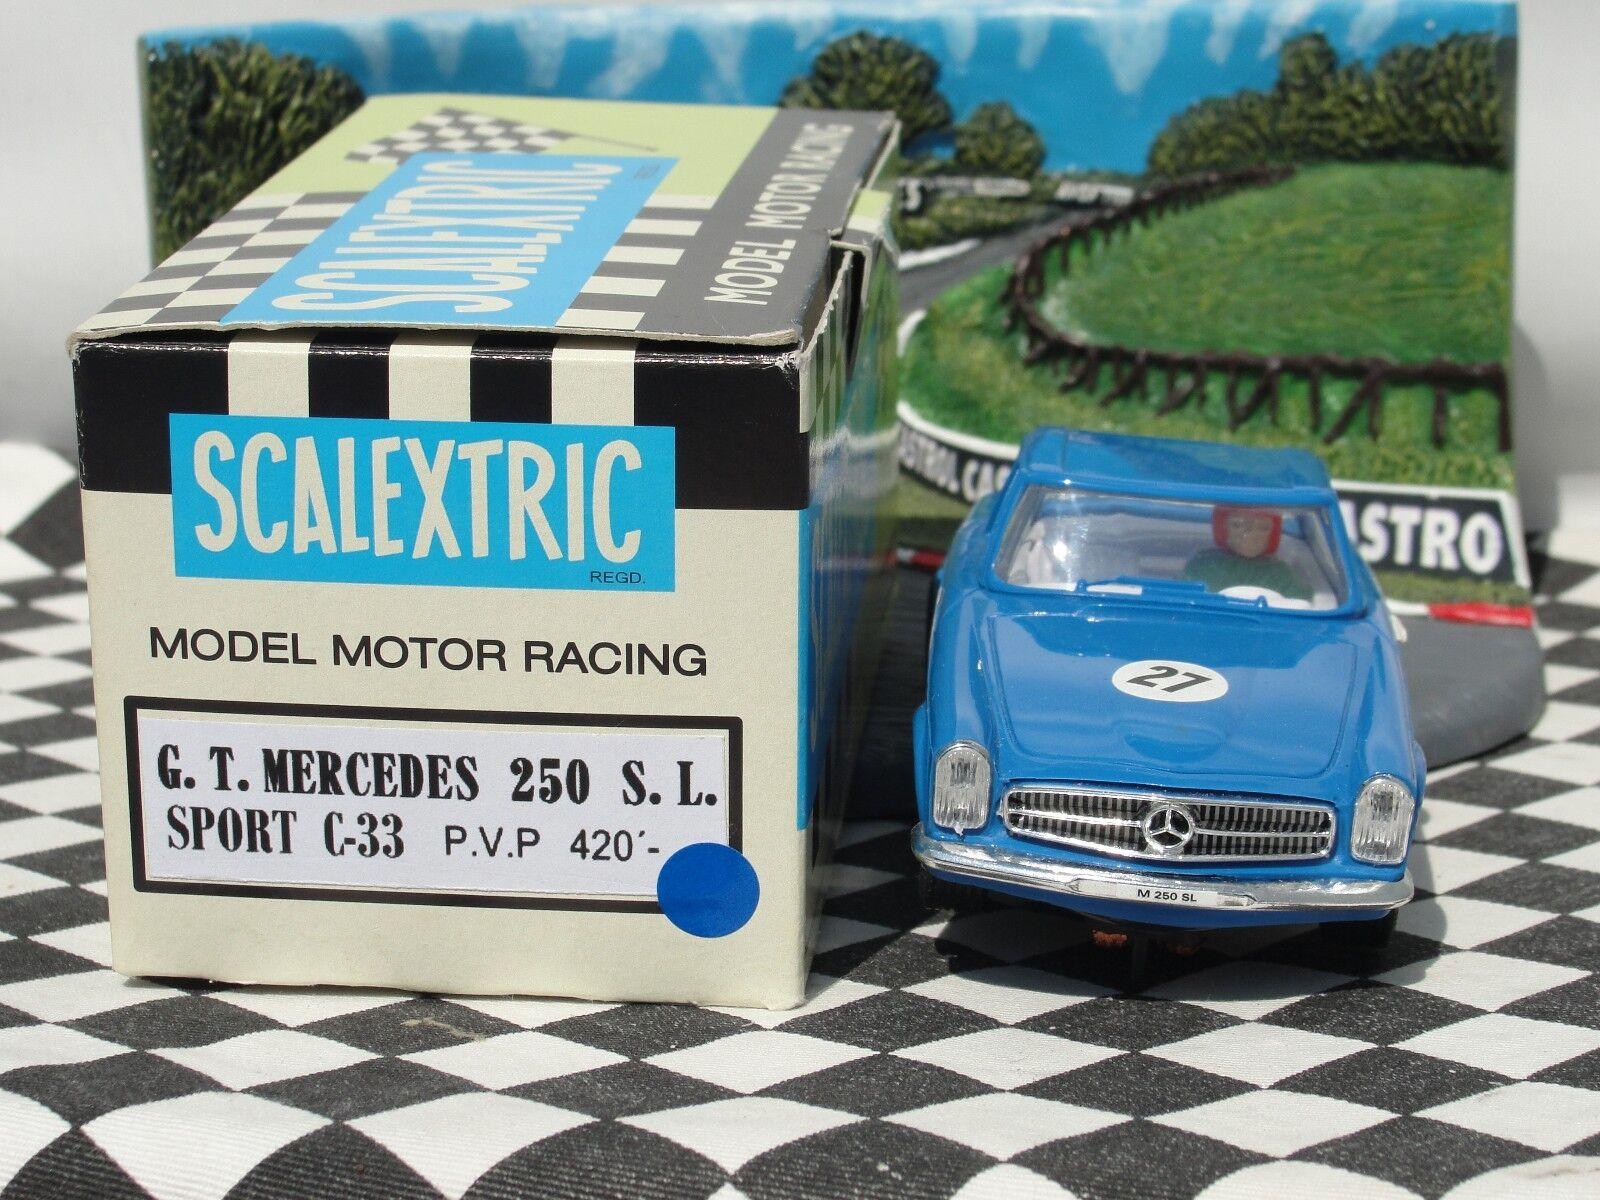 Scalextric espagnol G.T. G.T. G.T. Mercedes 250SL Bleu 27 1:32 Slot EntièreHommes t neuf dans sa boîte 80f3a3